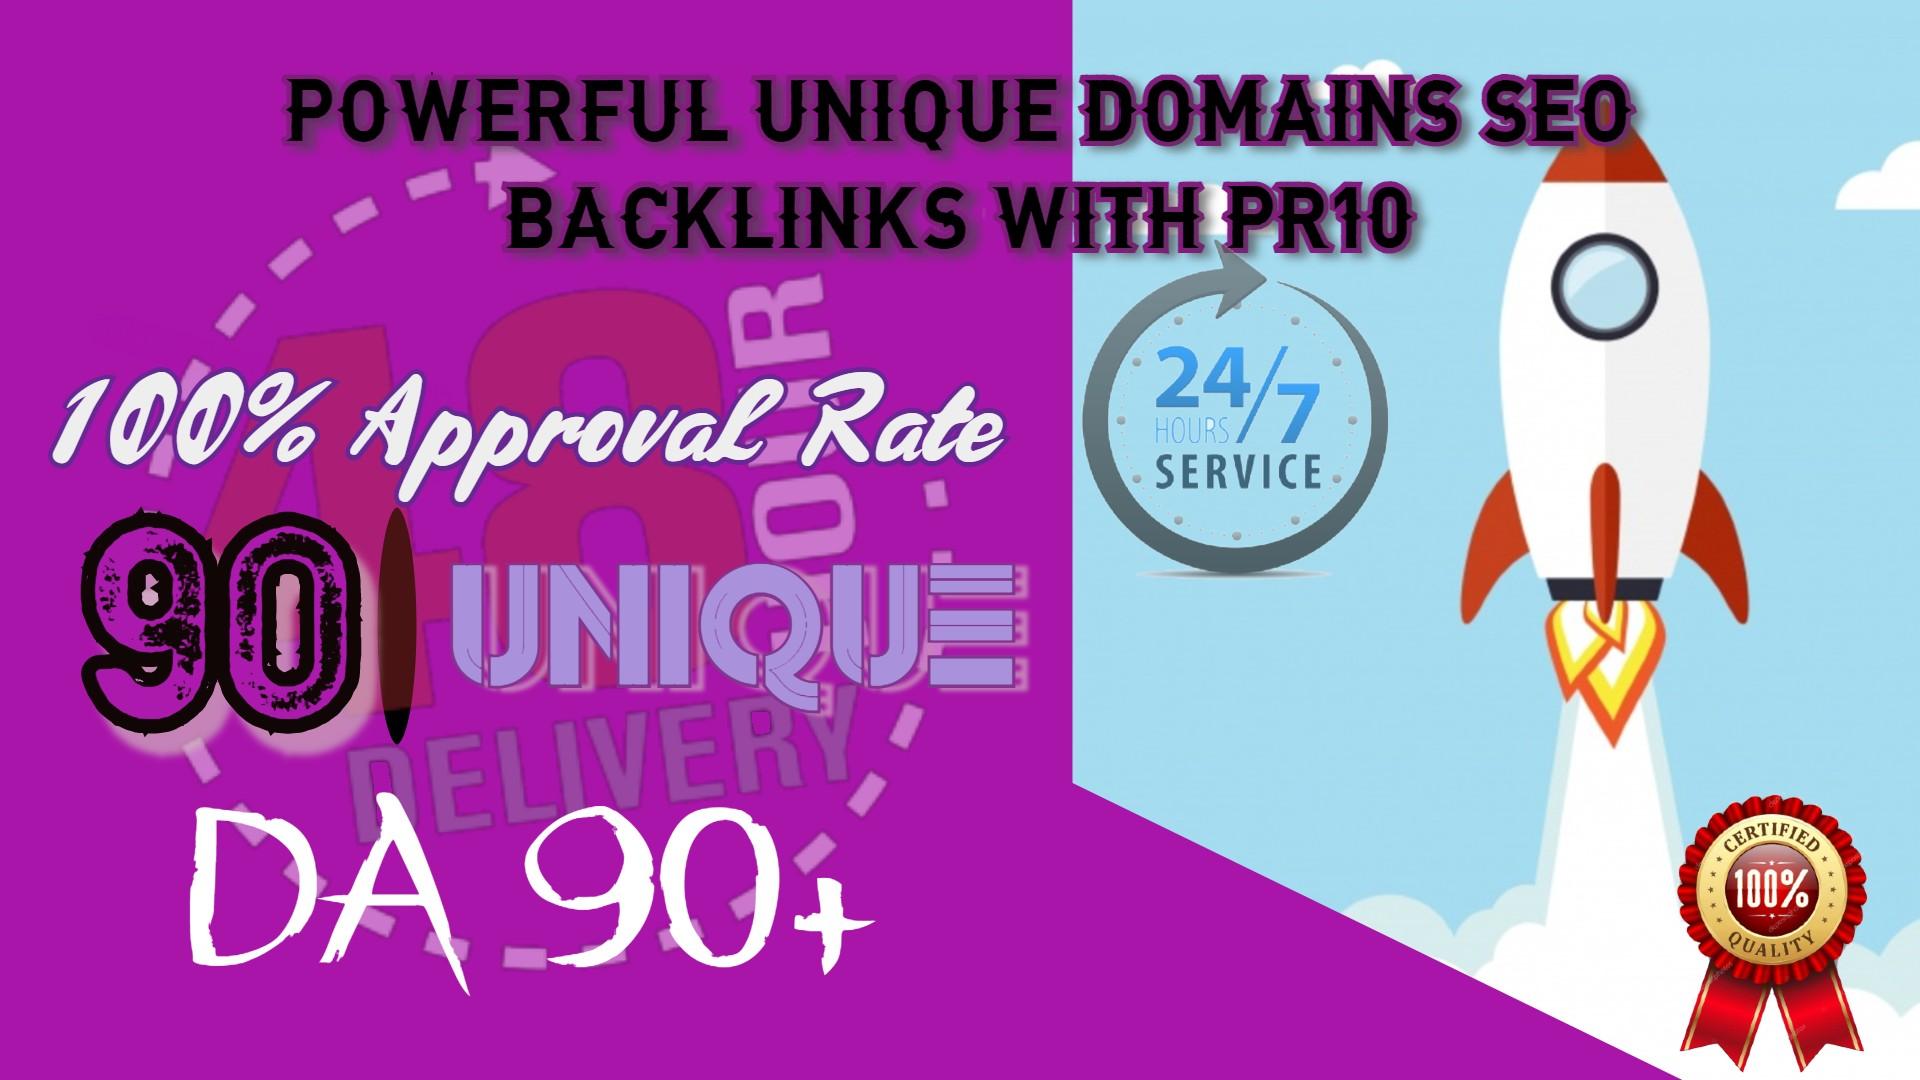 I WILL DO 90 UNIQUE PR10 SEO BackIinks on DA100 sites Plus Edu Links